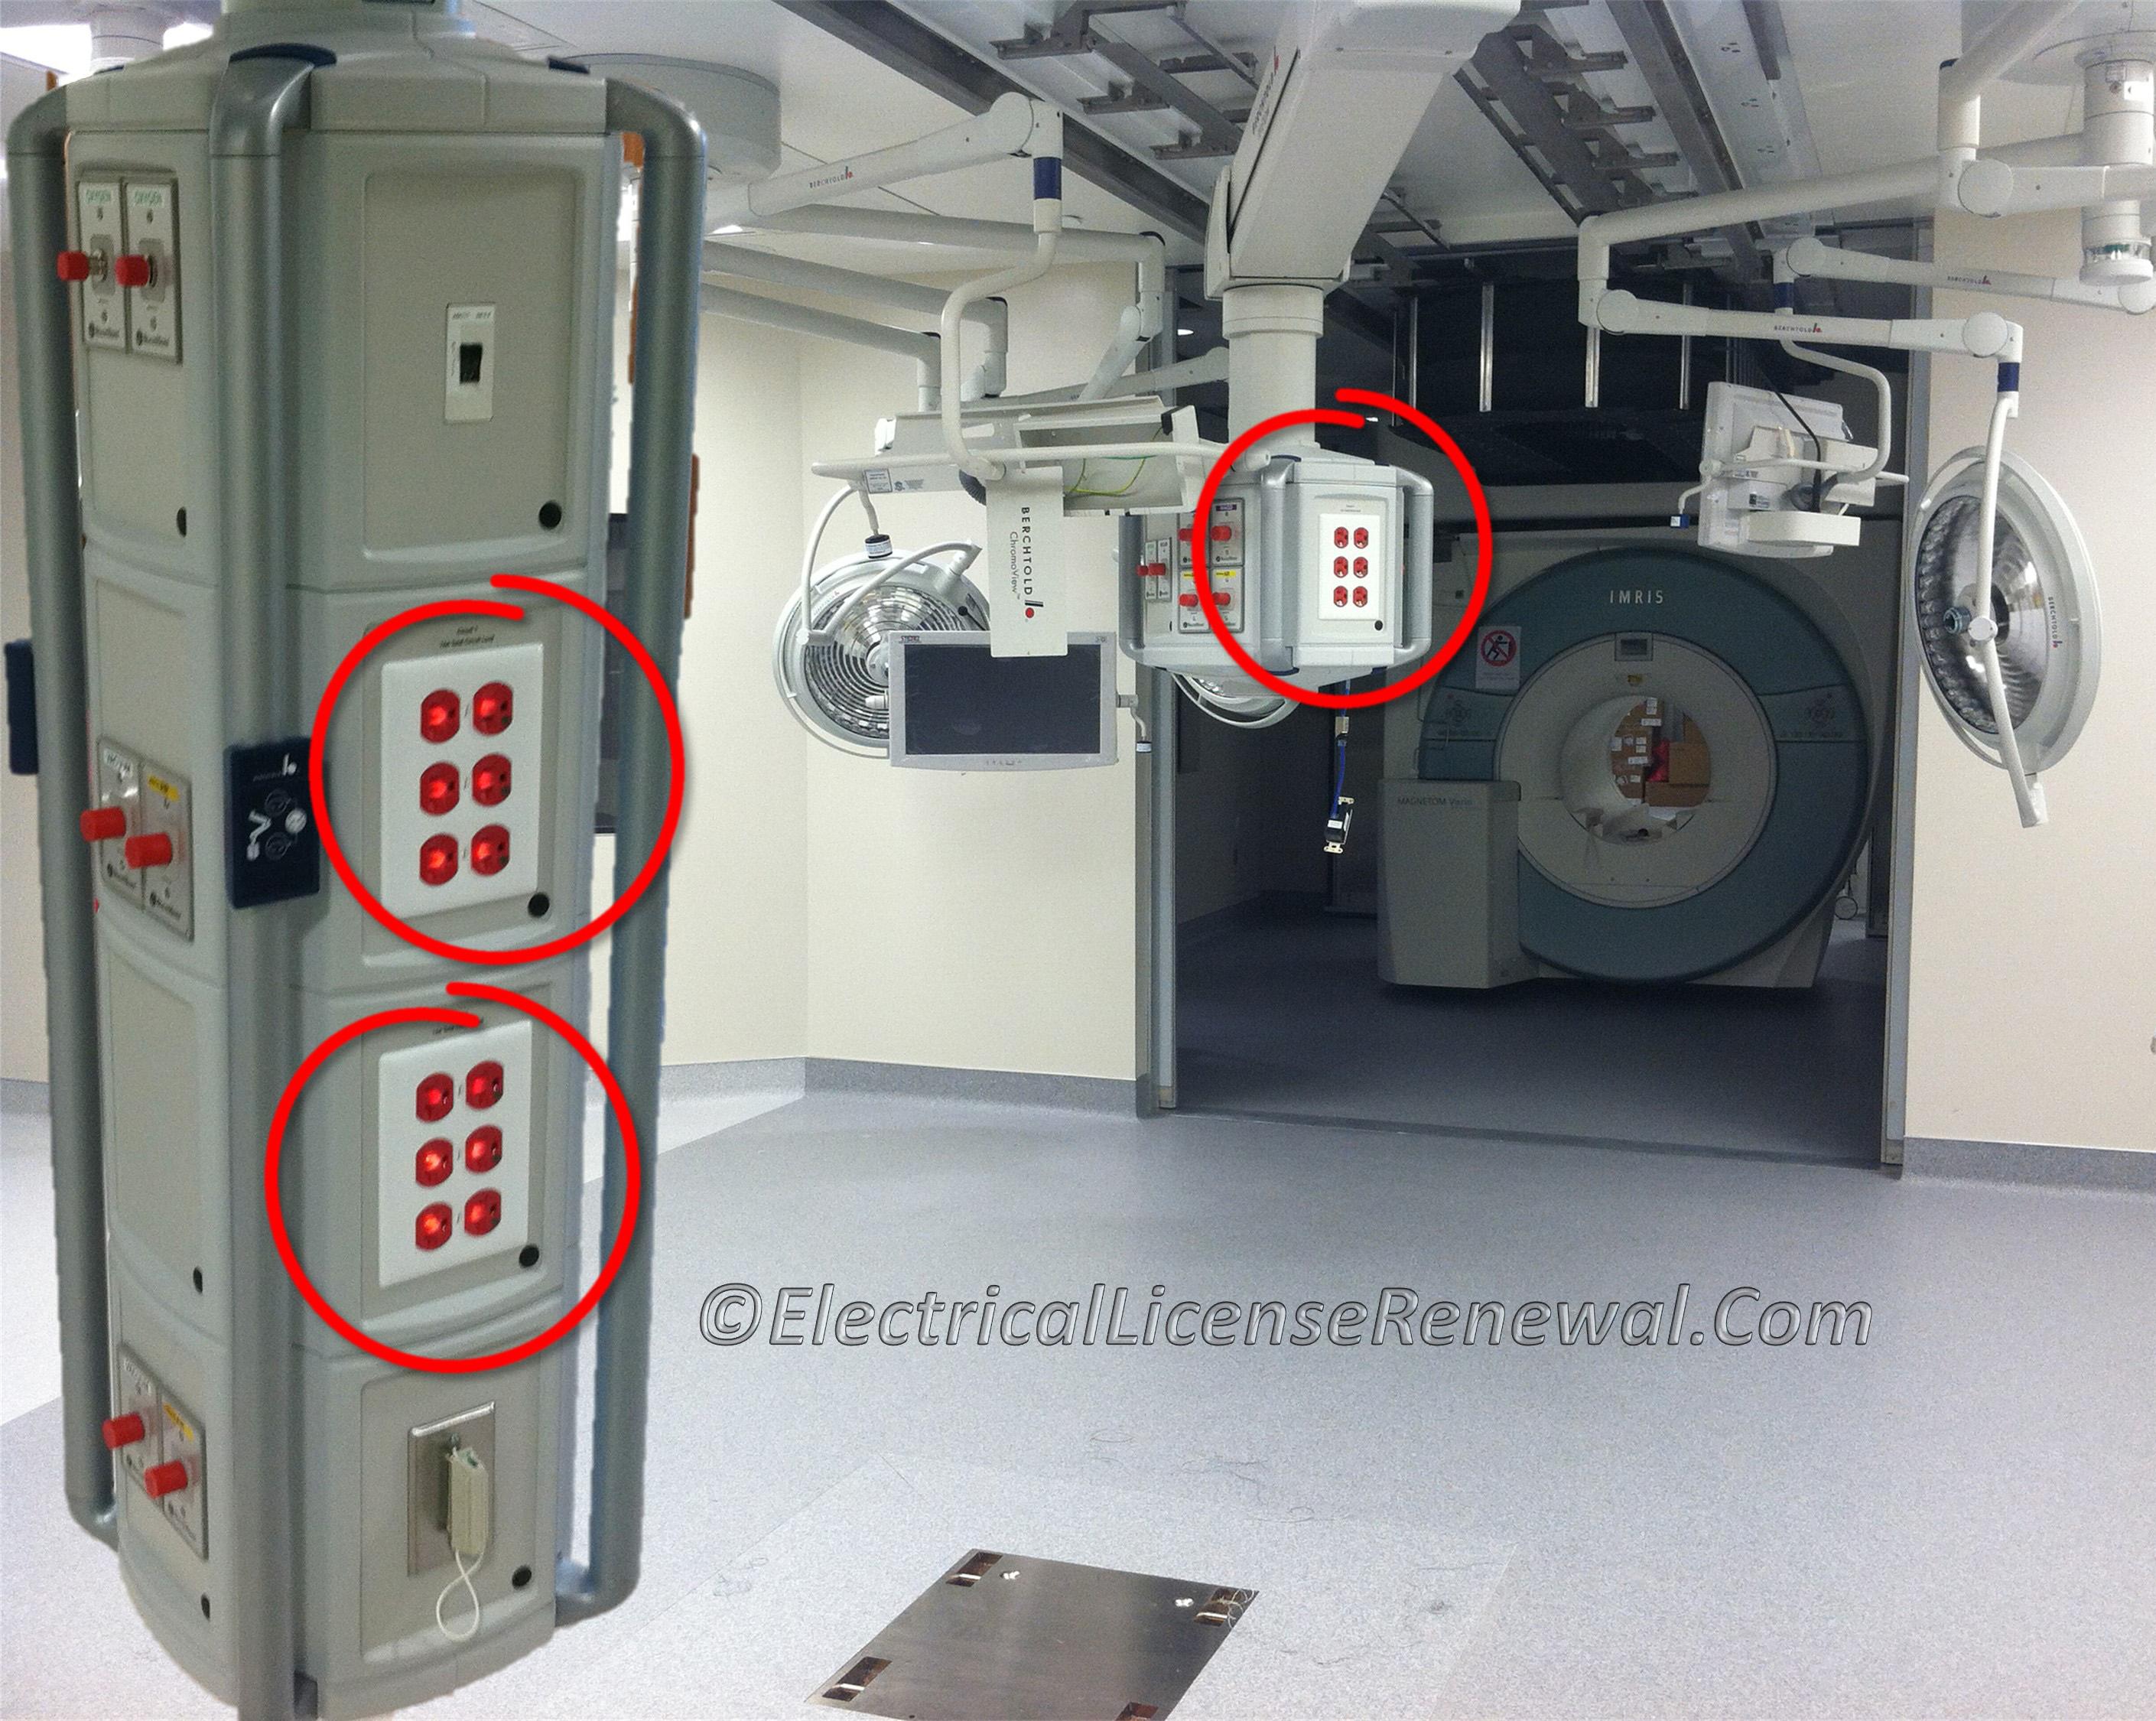 517.19(C) Operating Room Receptacles.